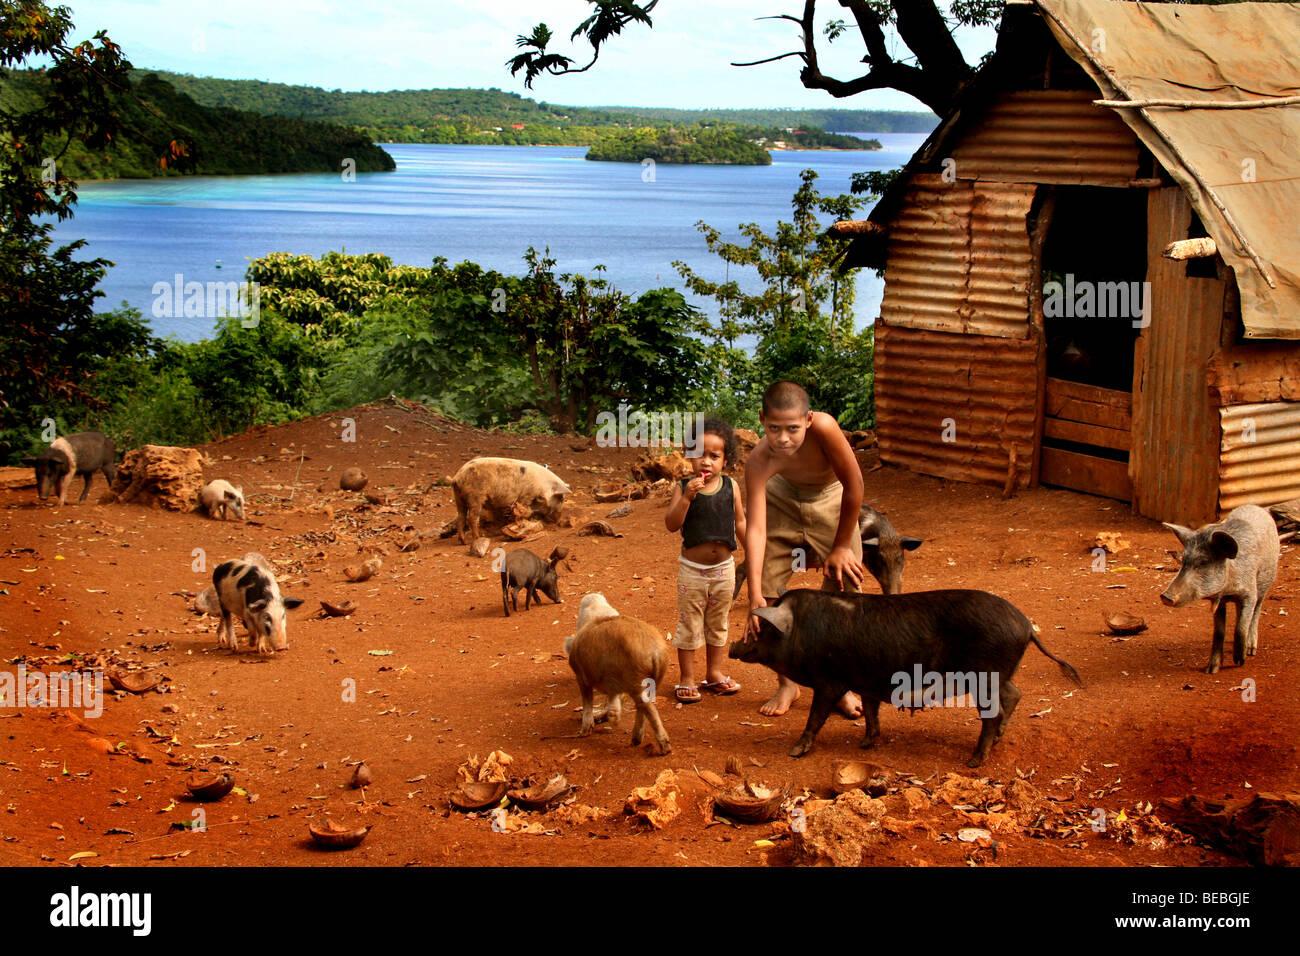 Pig Farm Vavau Tonga - Stock Image